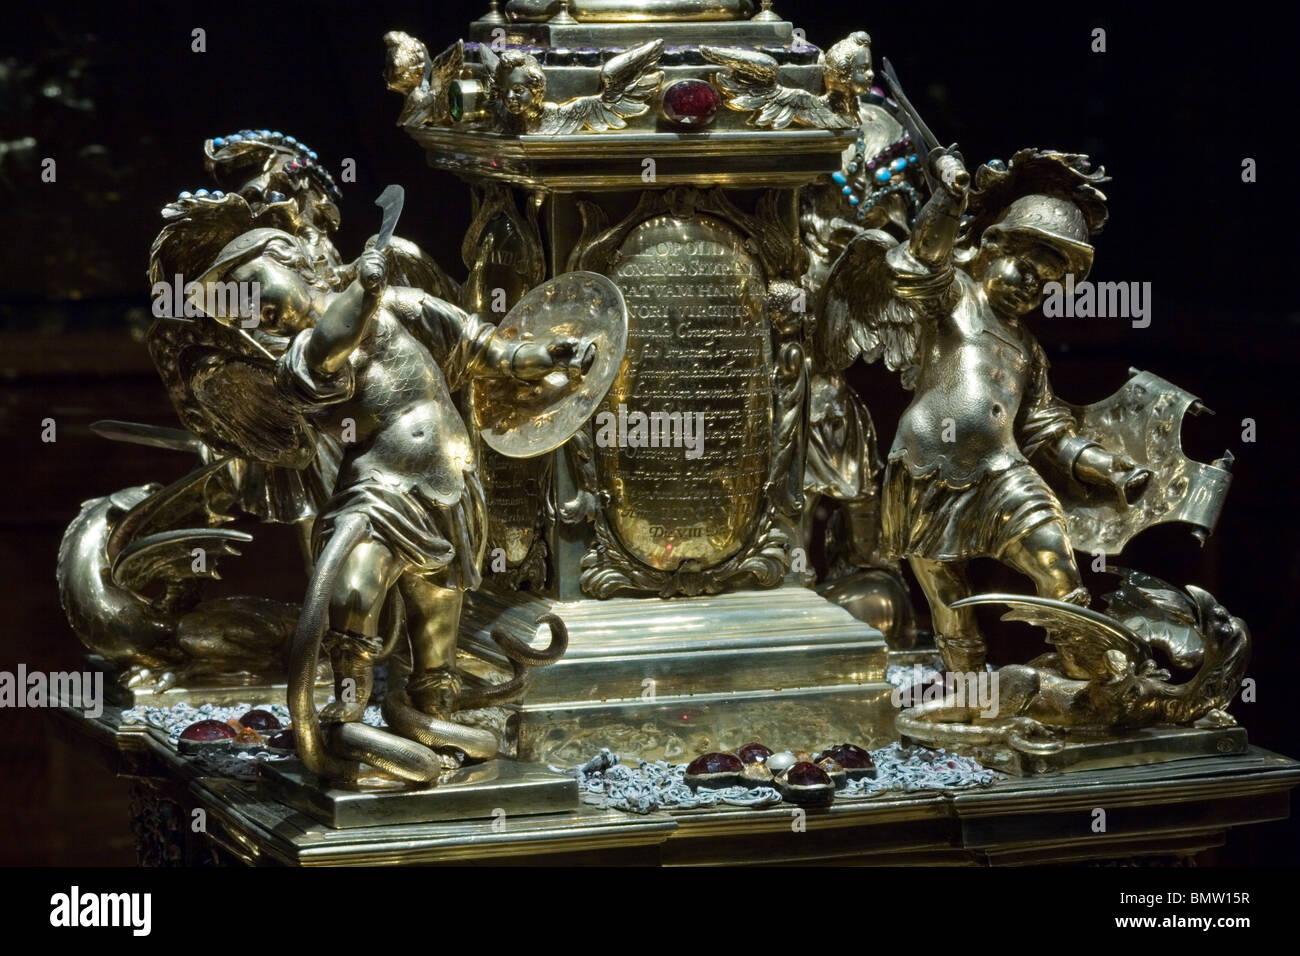 Baroque sculpture - Stock Image